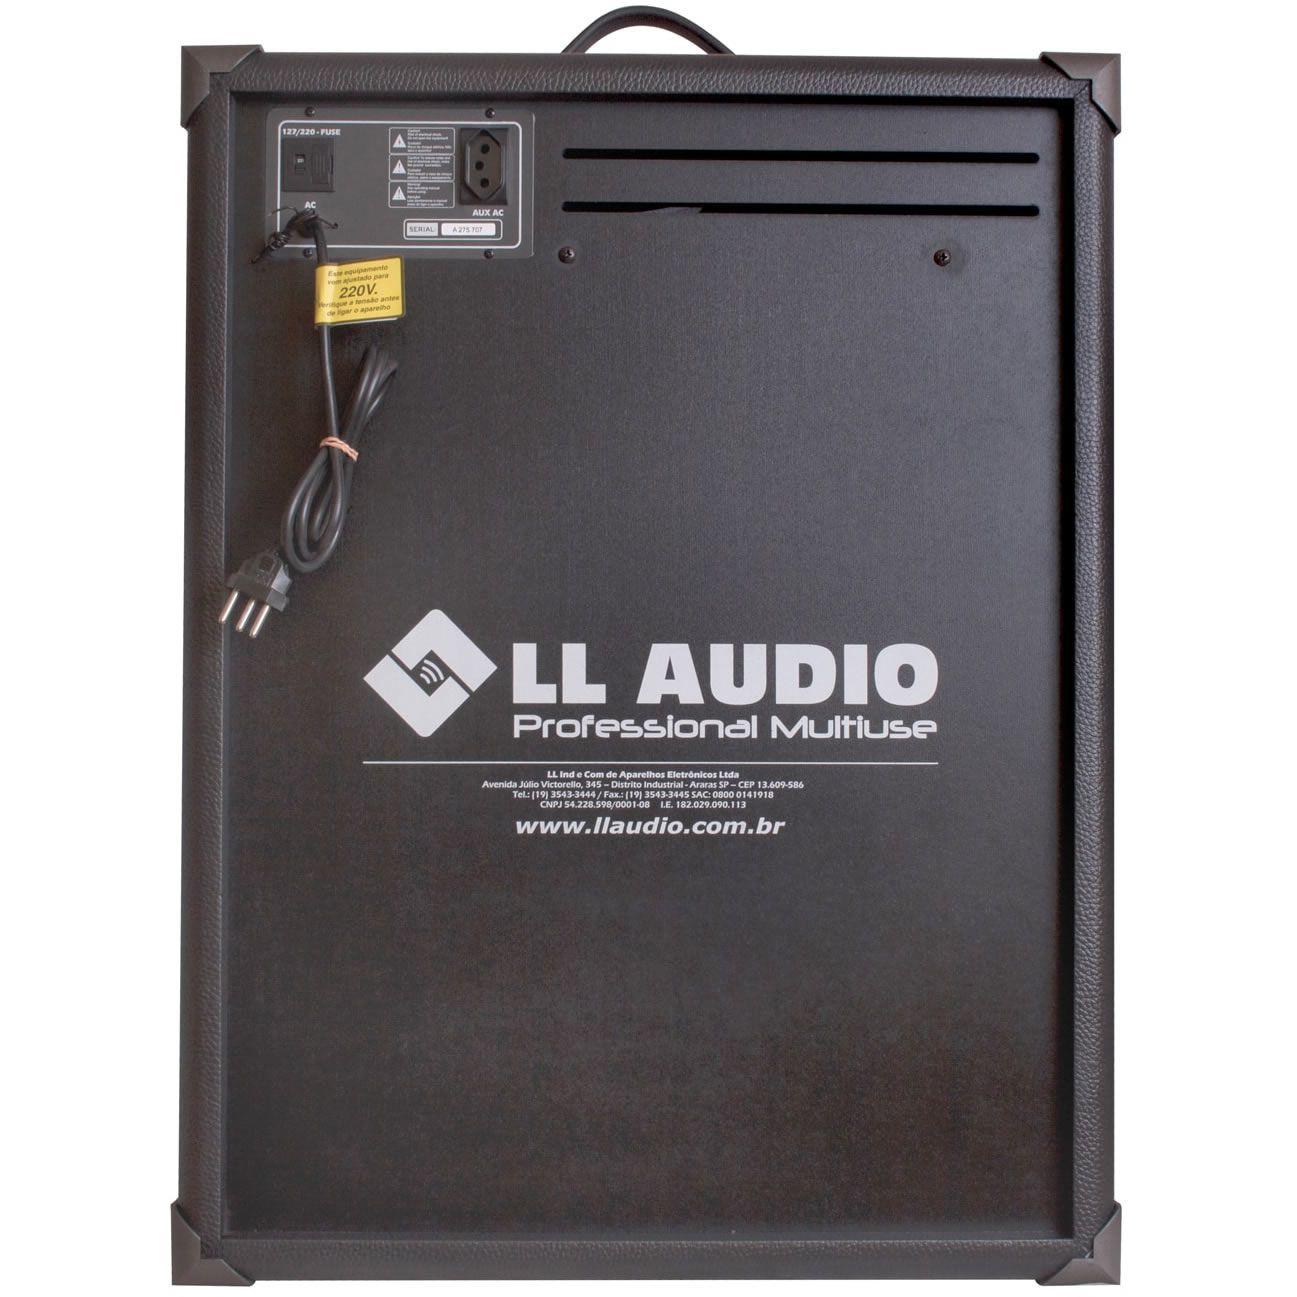 "Caixa de Som LL AUDIO Multiuso 10"" 60W TRX10 USB"